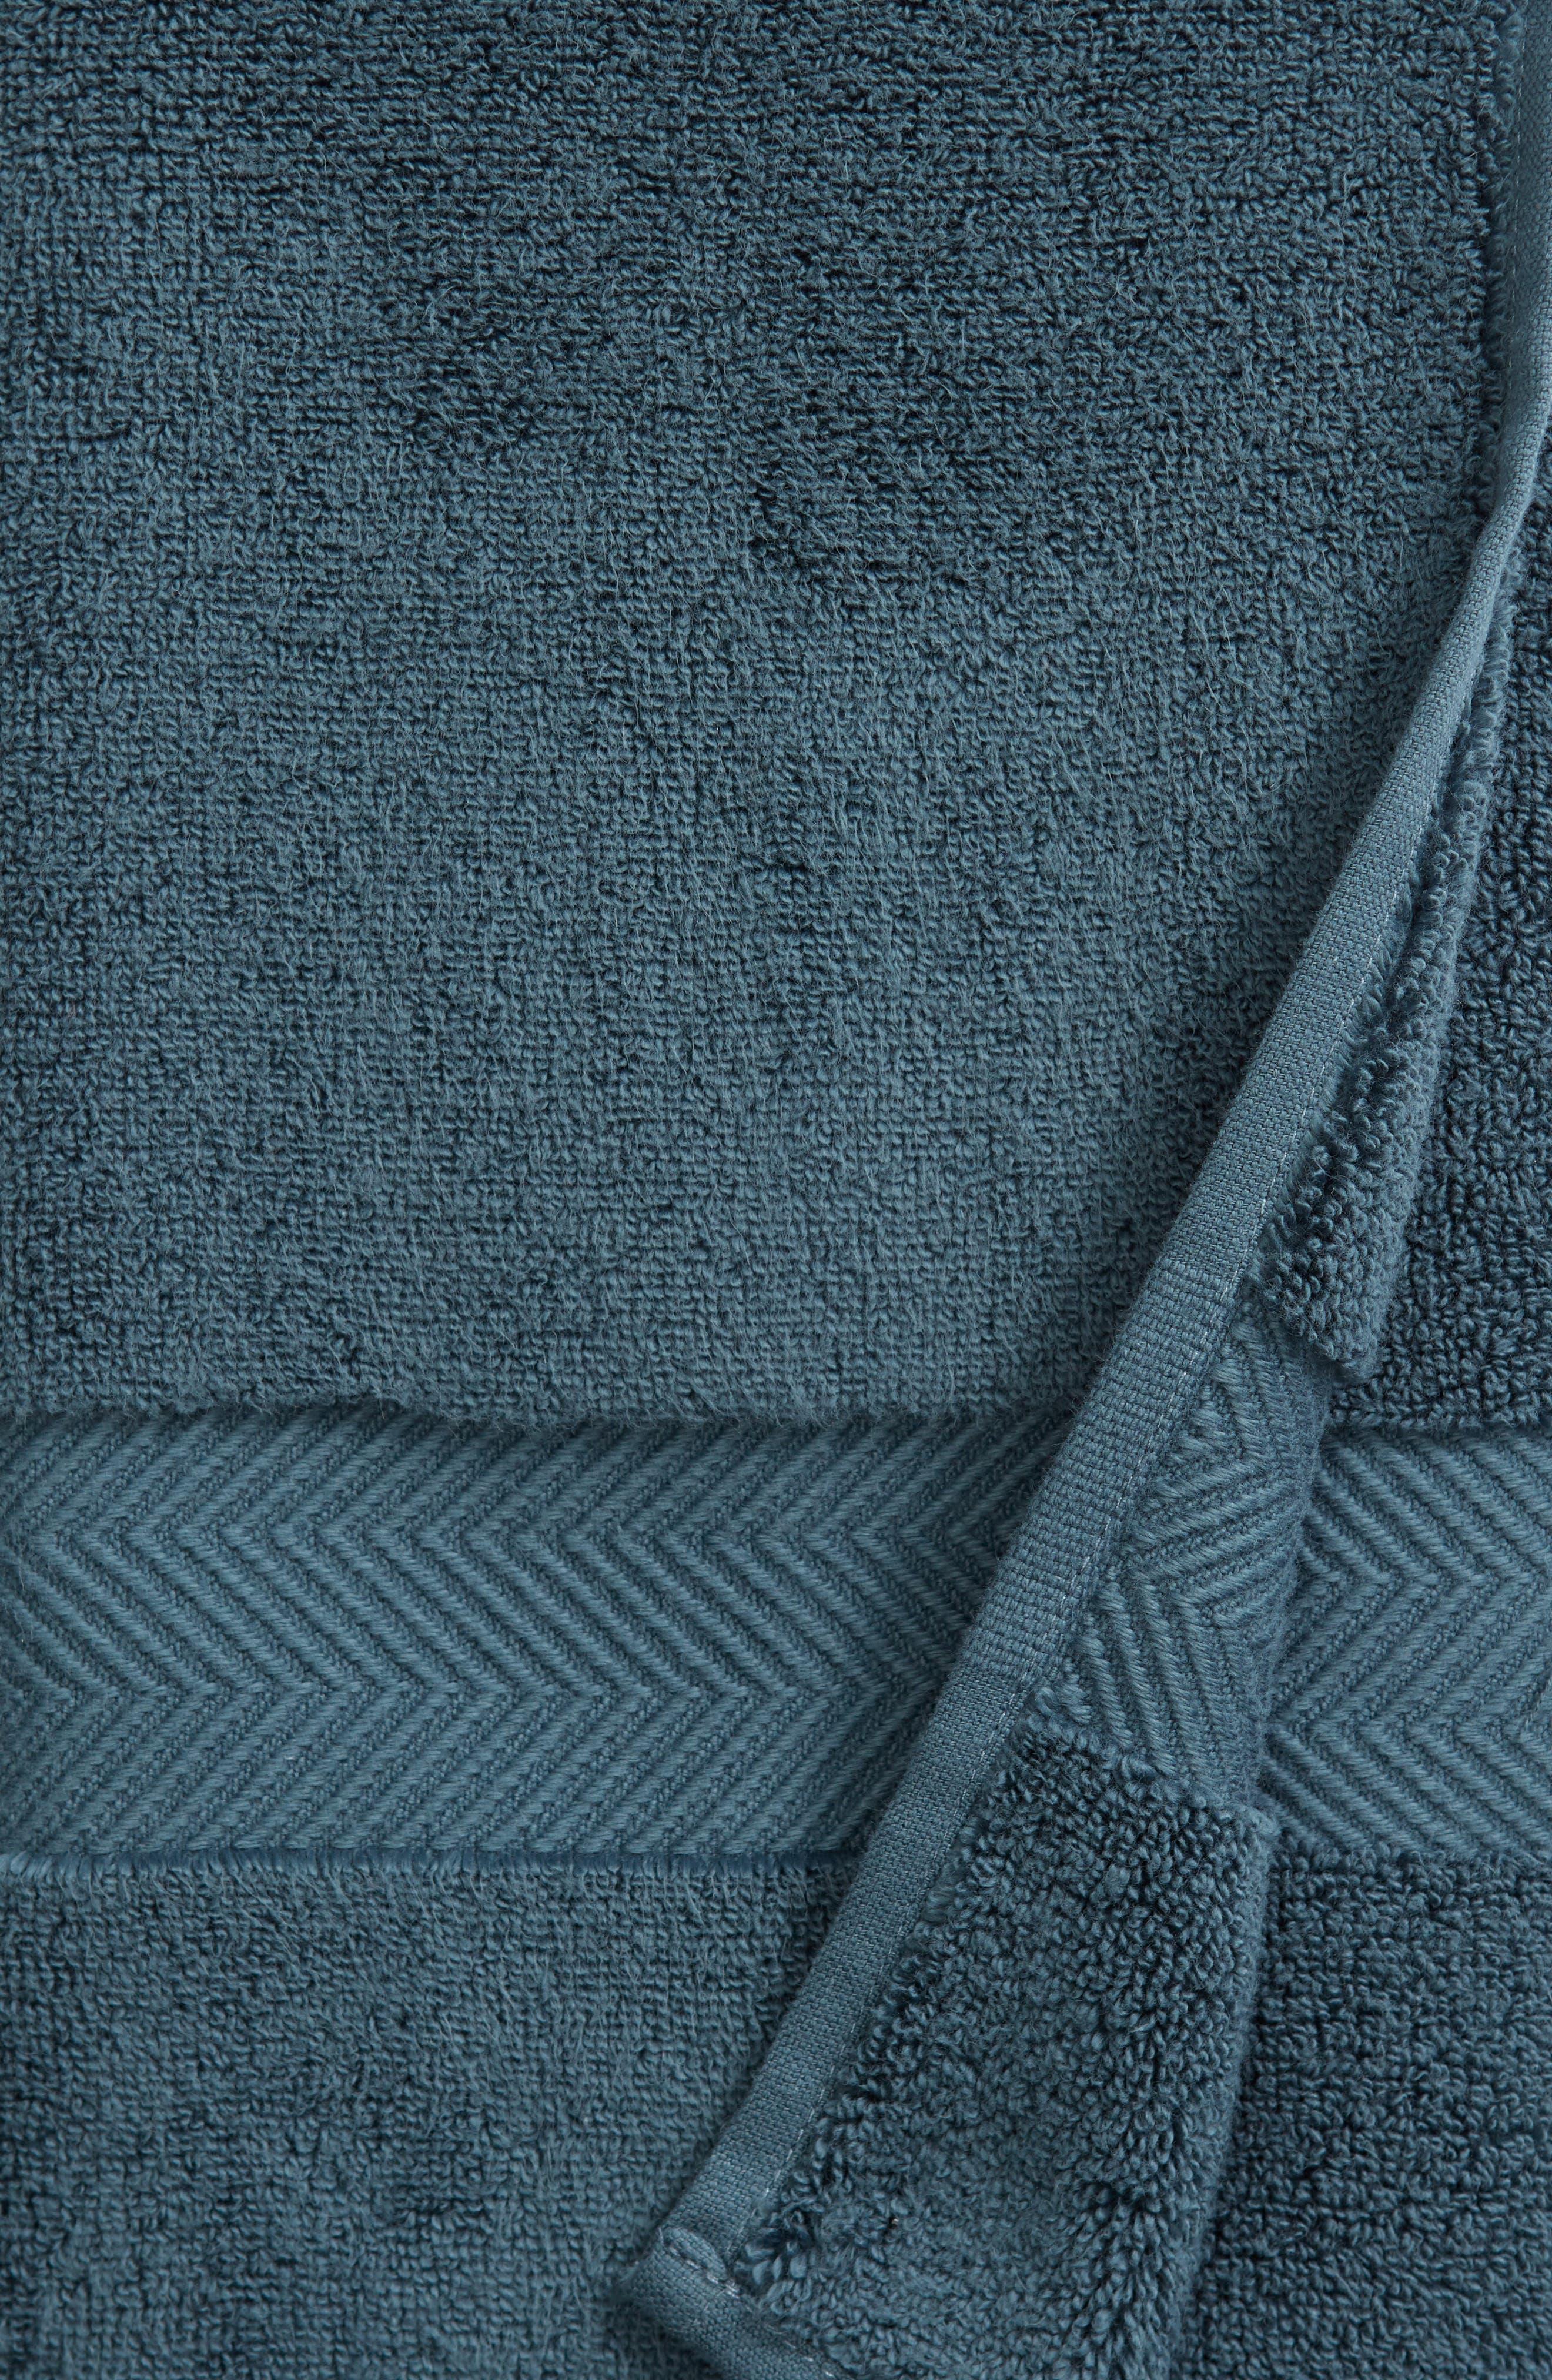 Hydrocotton Hand Towel,                             Alternate thumbnail 3, color,                             TEAL GAZER